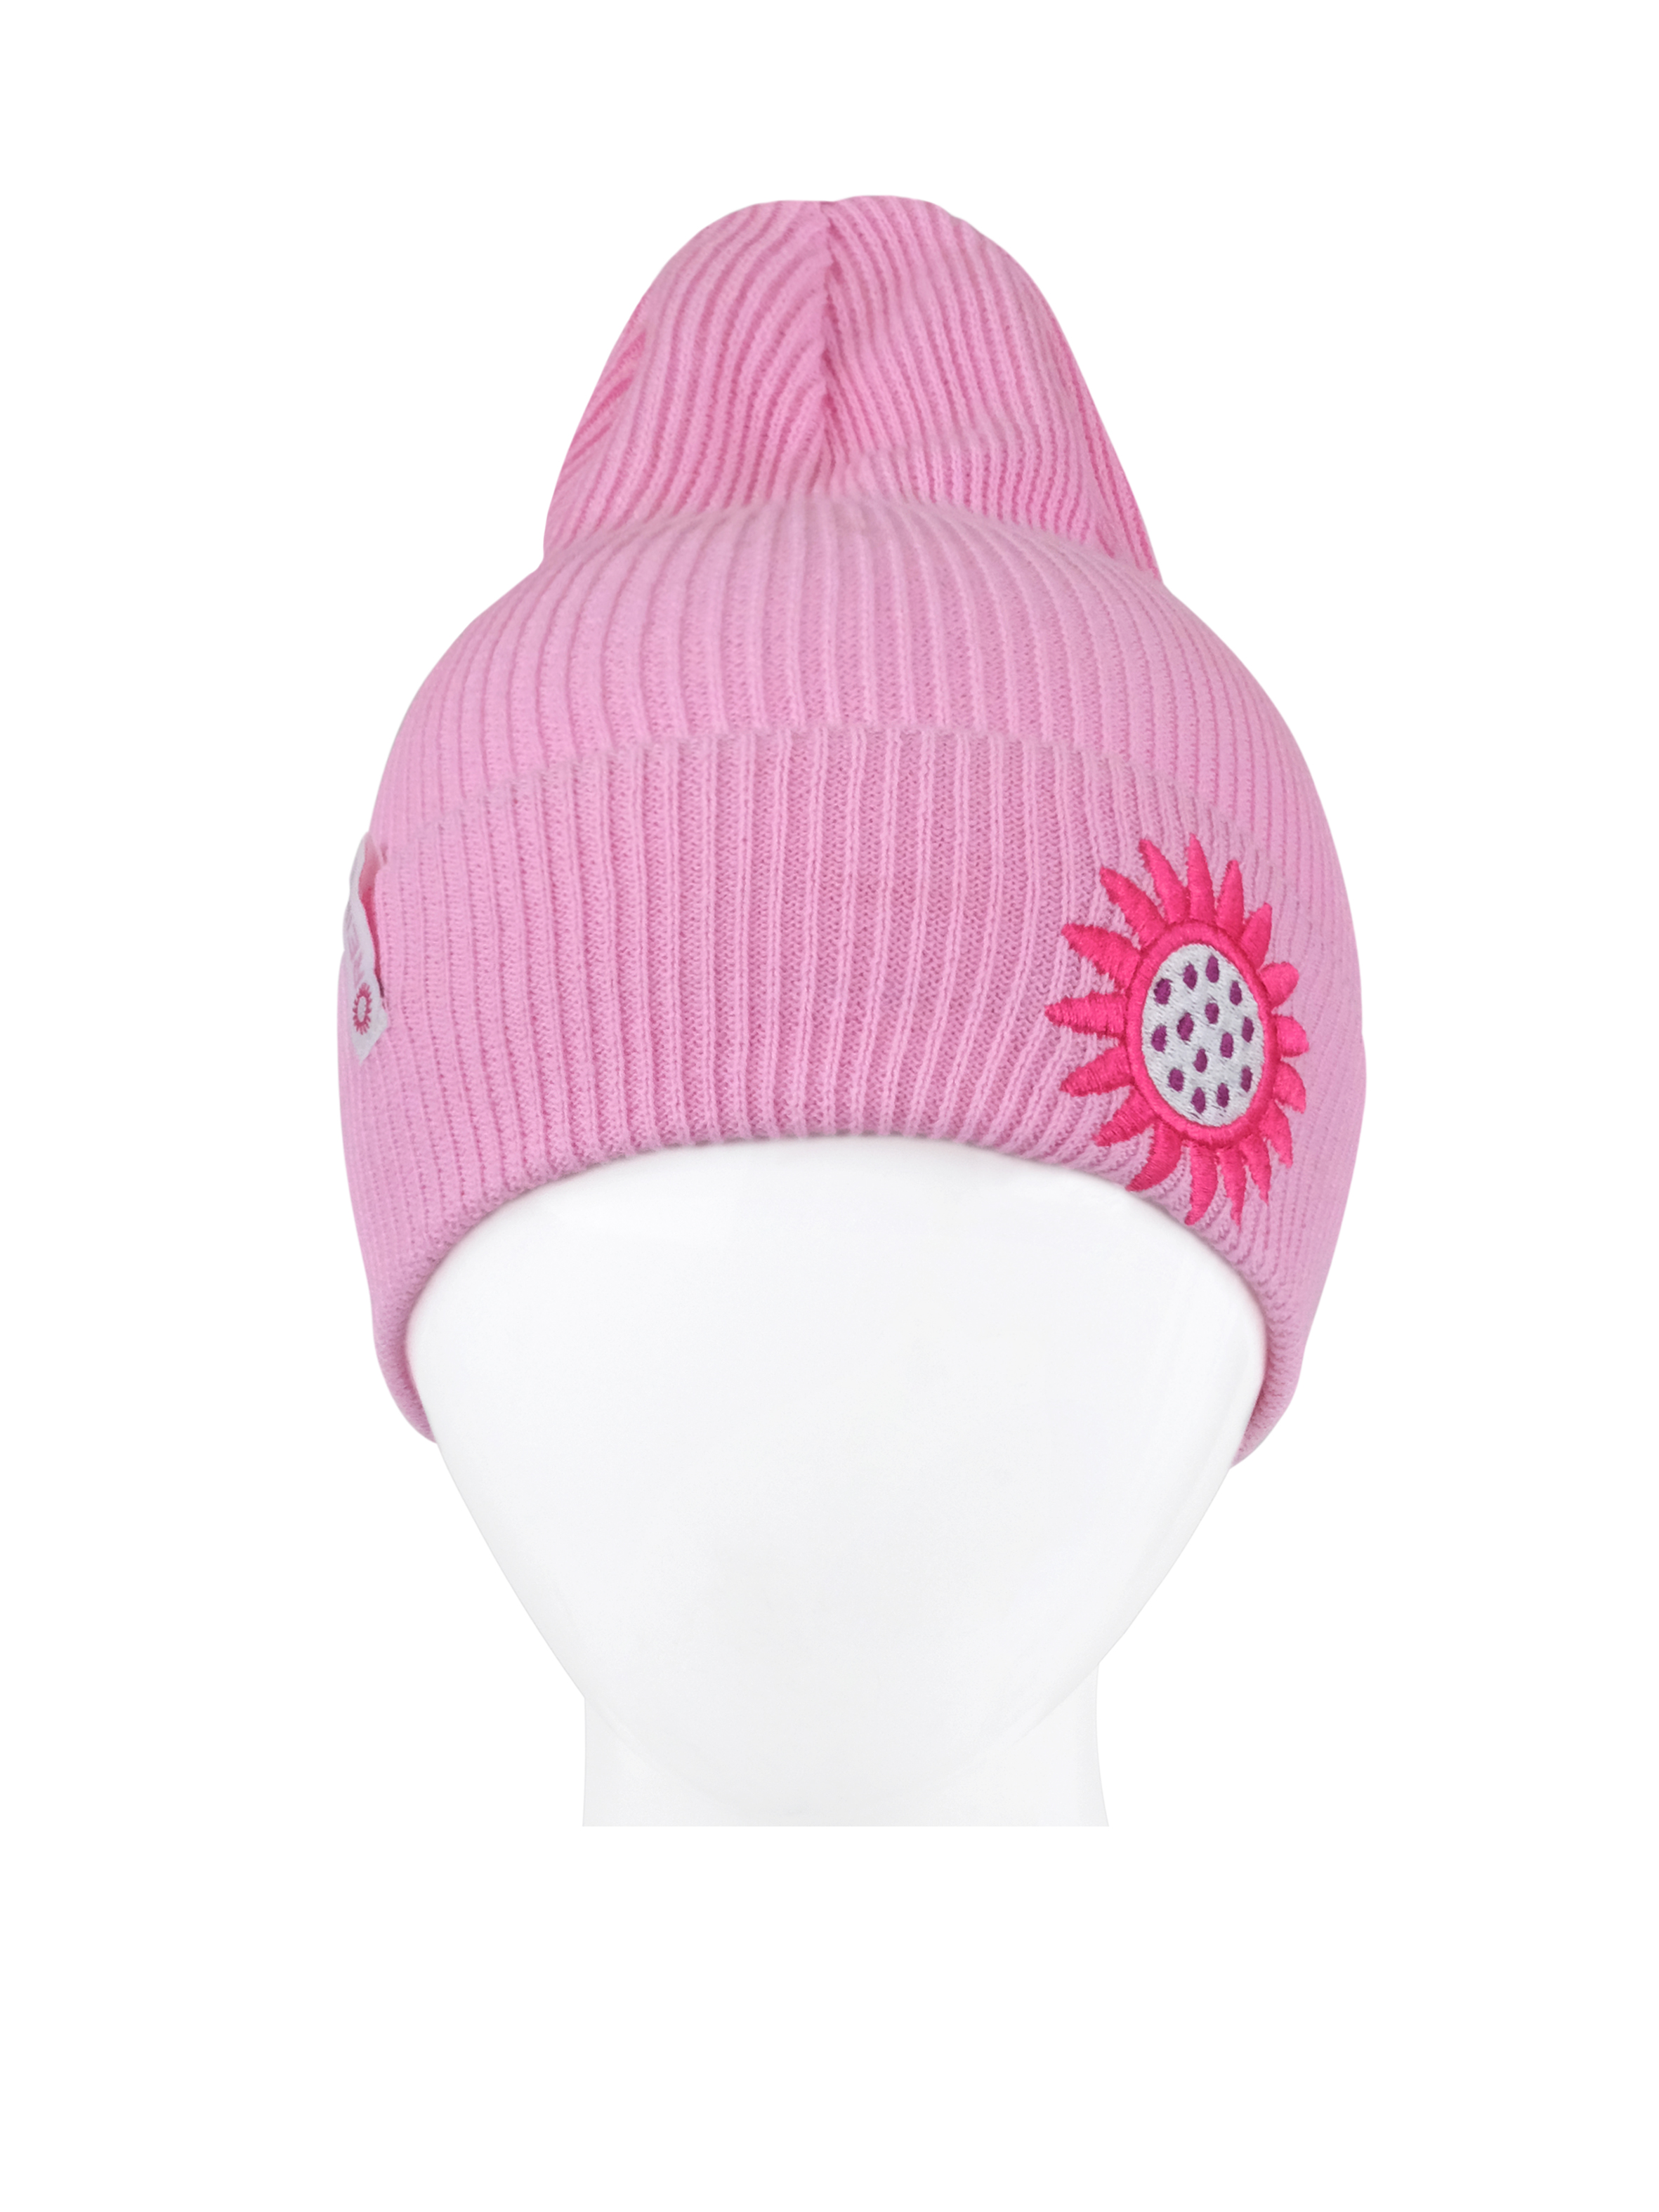 Купить Шапка для девочки Reike Сute bees pink, RKNSS20-CUB-YN-5 pink, р.50,